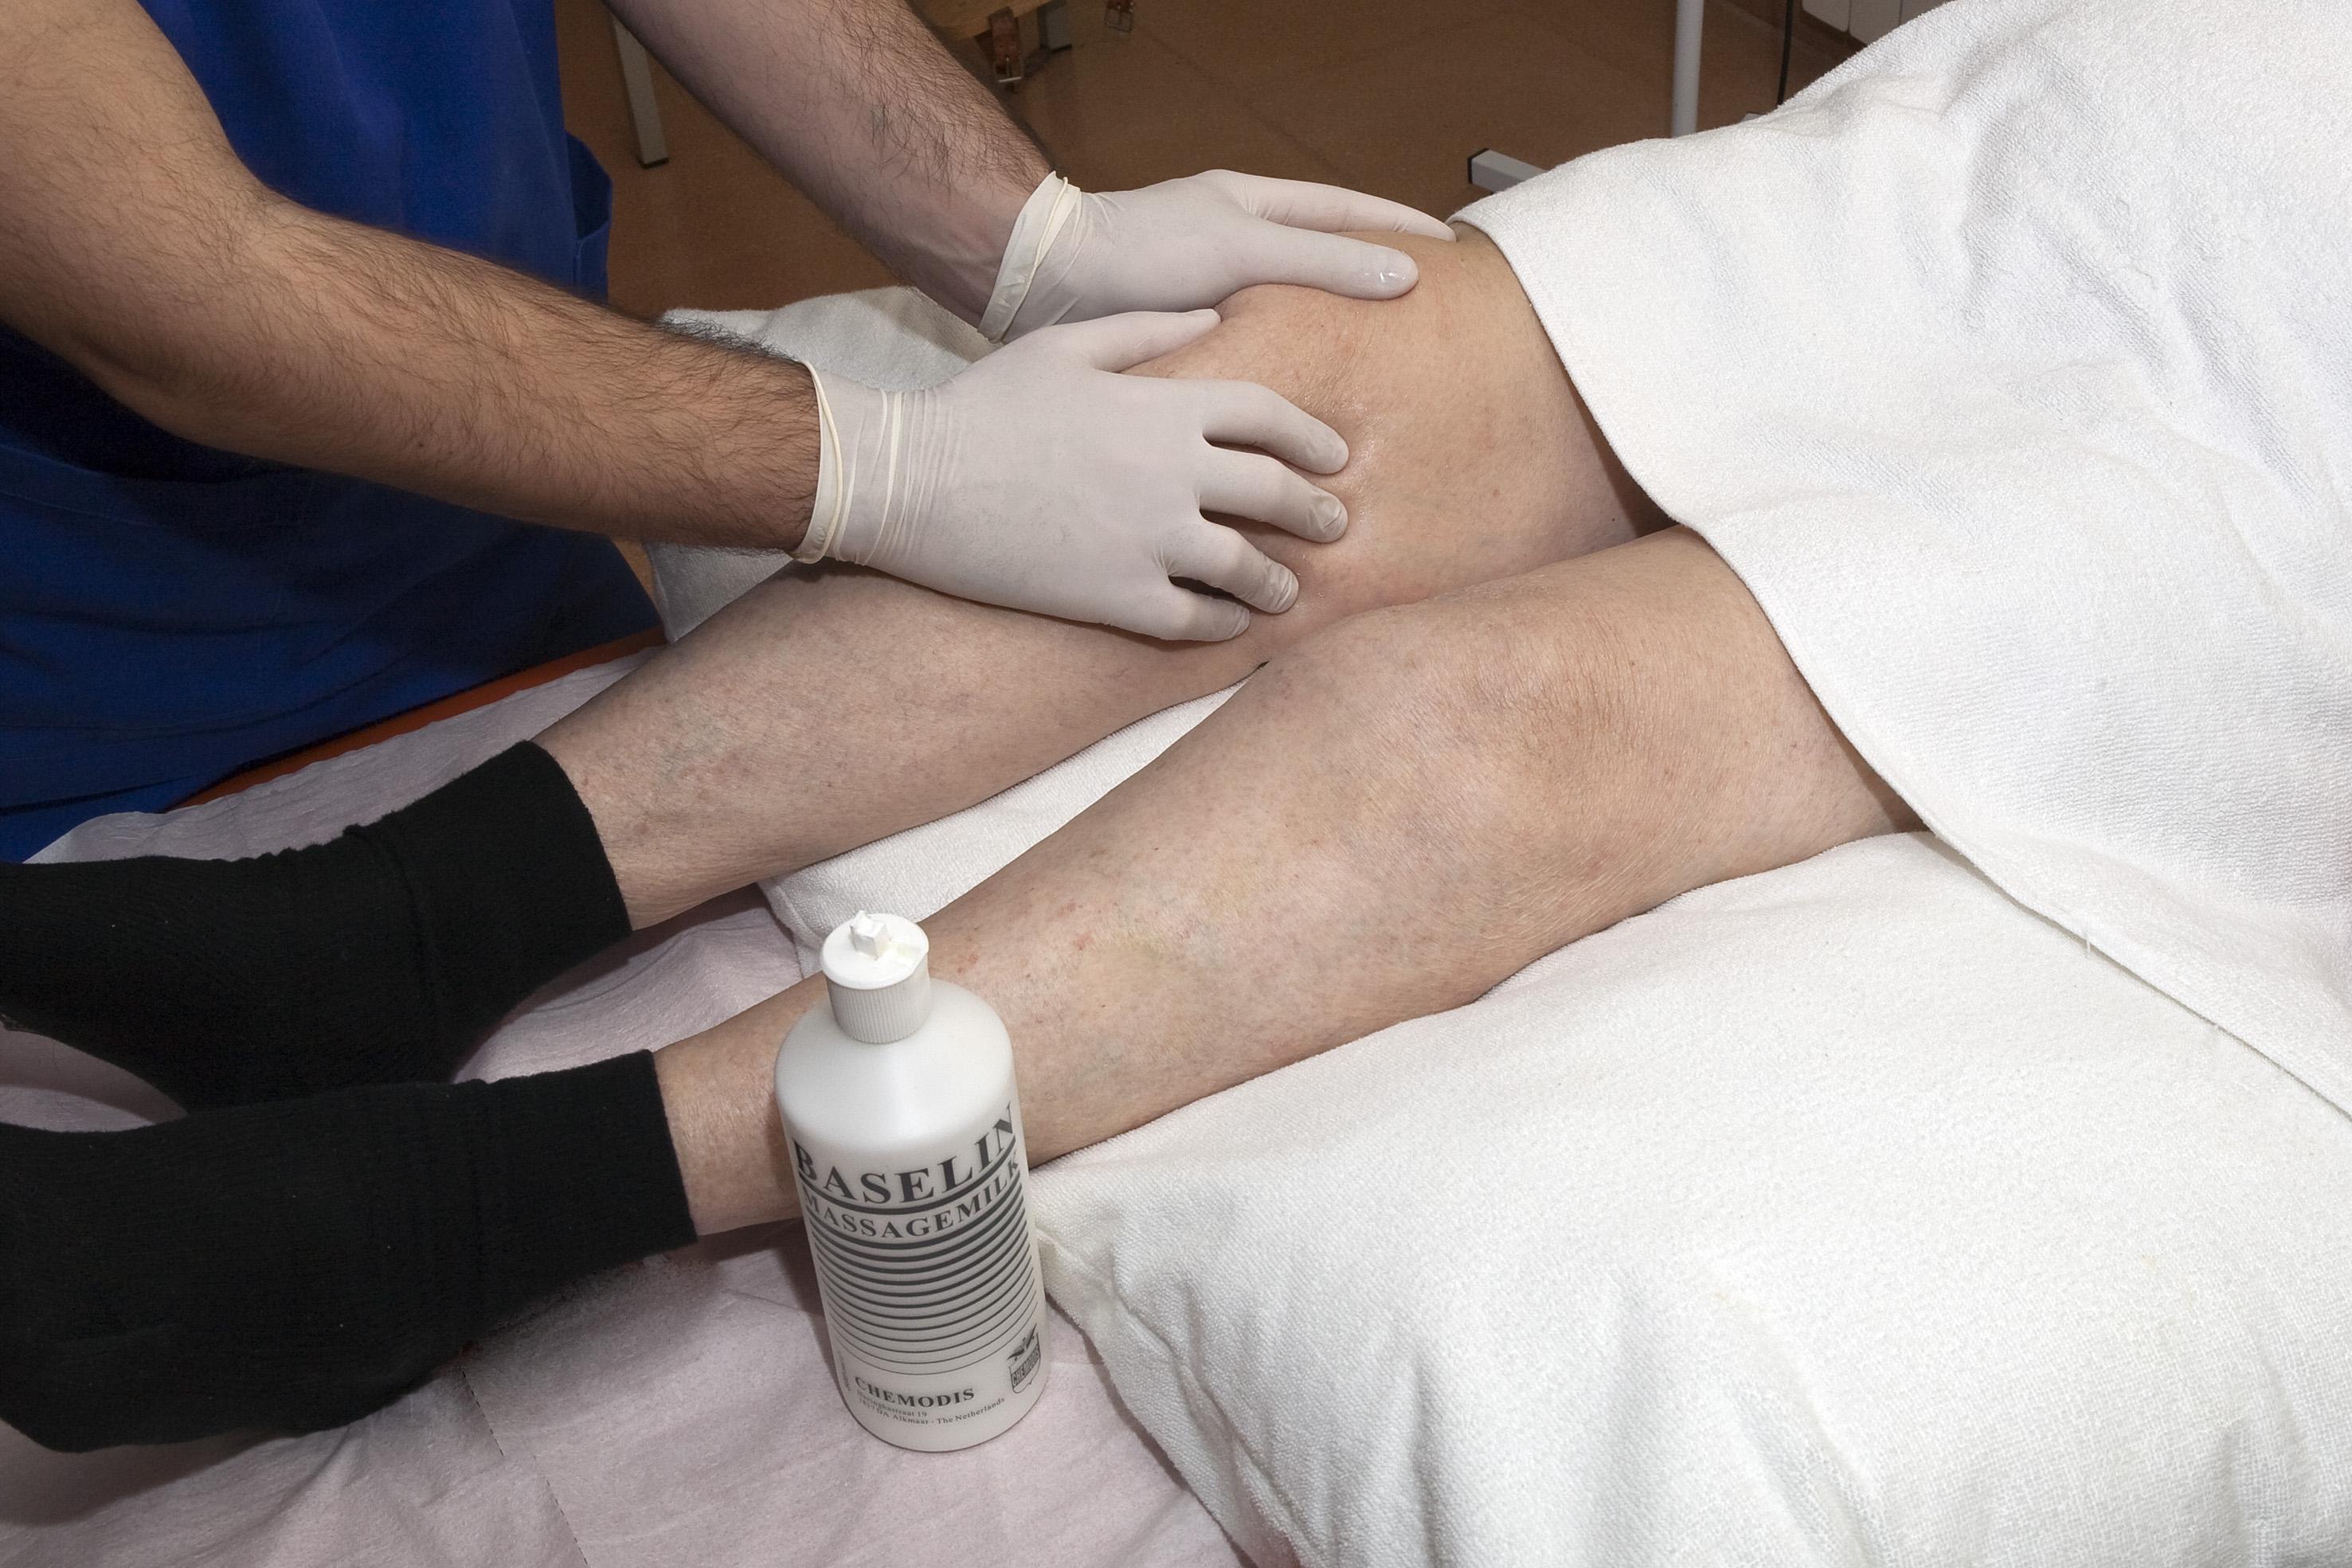 afeccions-reumatologiques-definicio-residencia-palau-can-sunyer